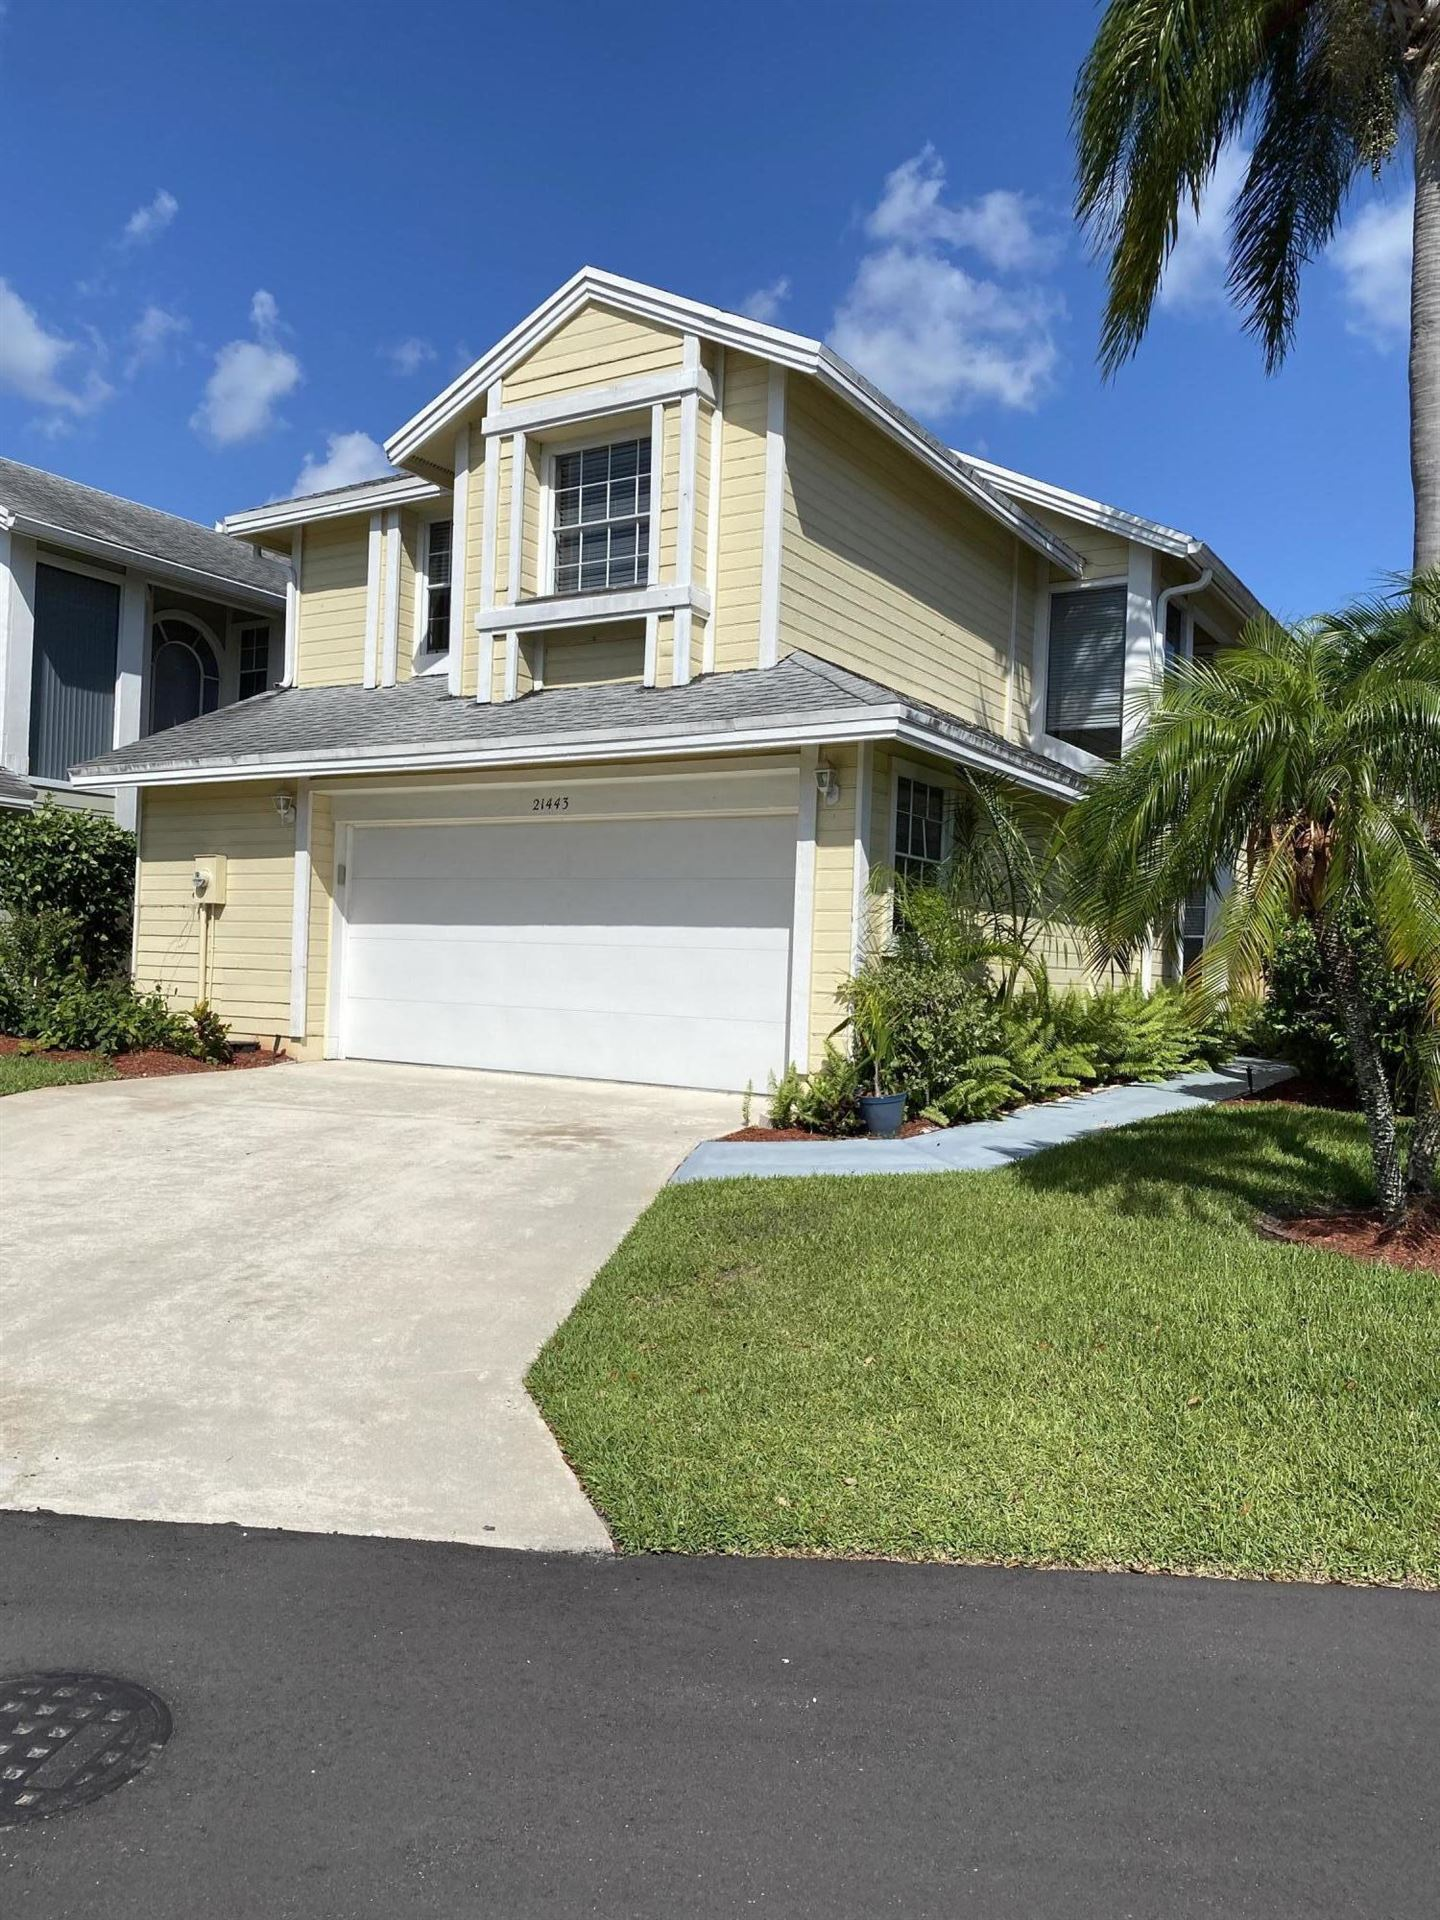 21443 Fairfield Lane, Boca Raton, FL 33486 - #: RX-10717989